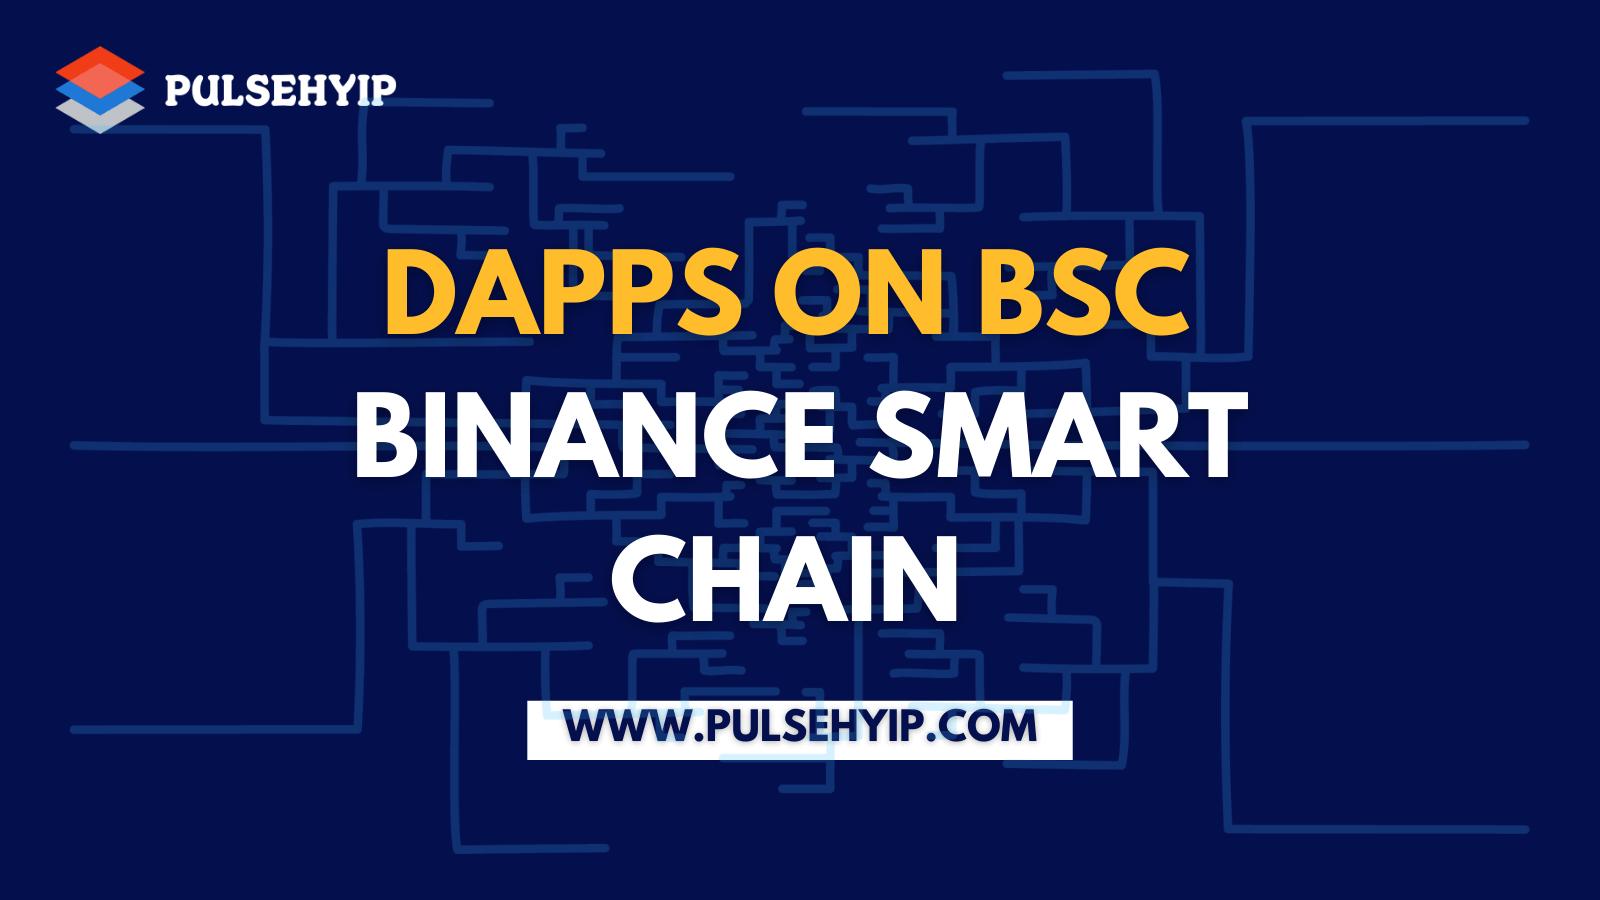 Best Binance Smart Chain (BSC) DApp Development Services